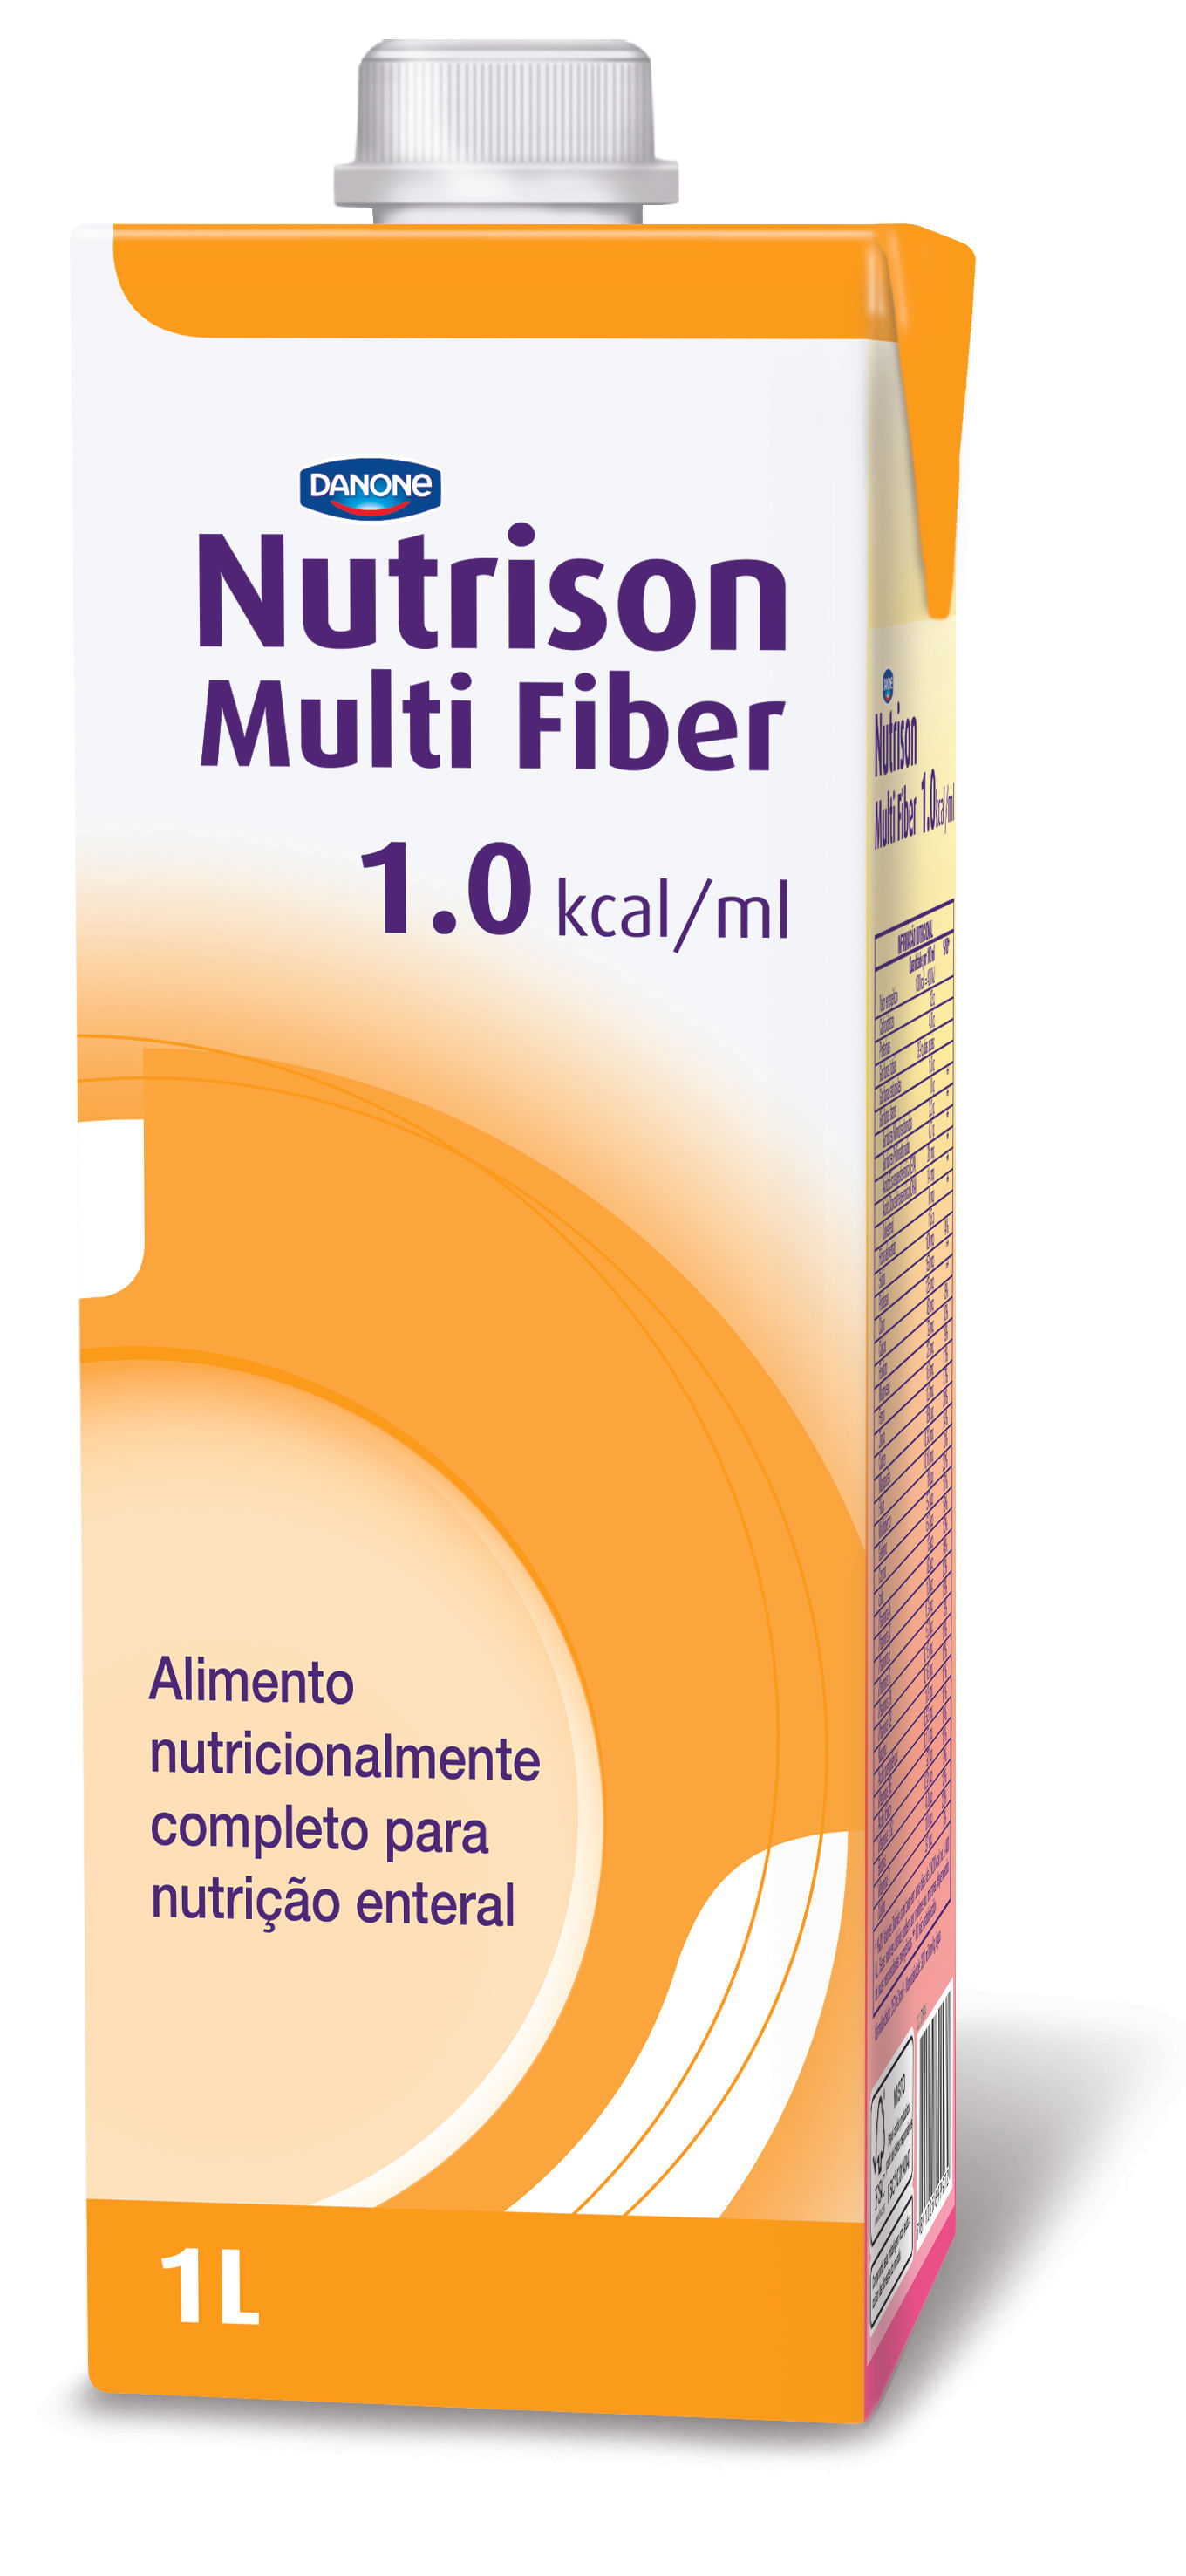 NUTRISON-MF-tetrapak